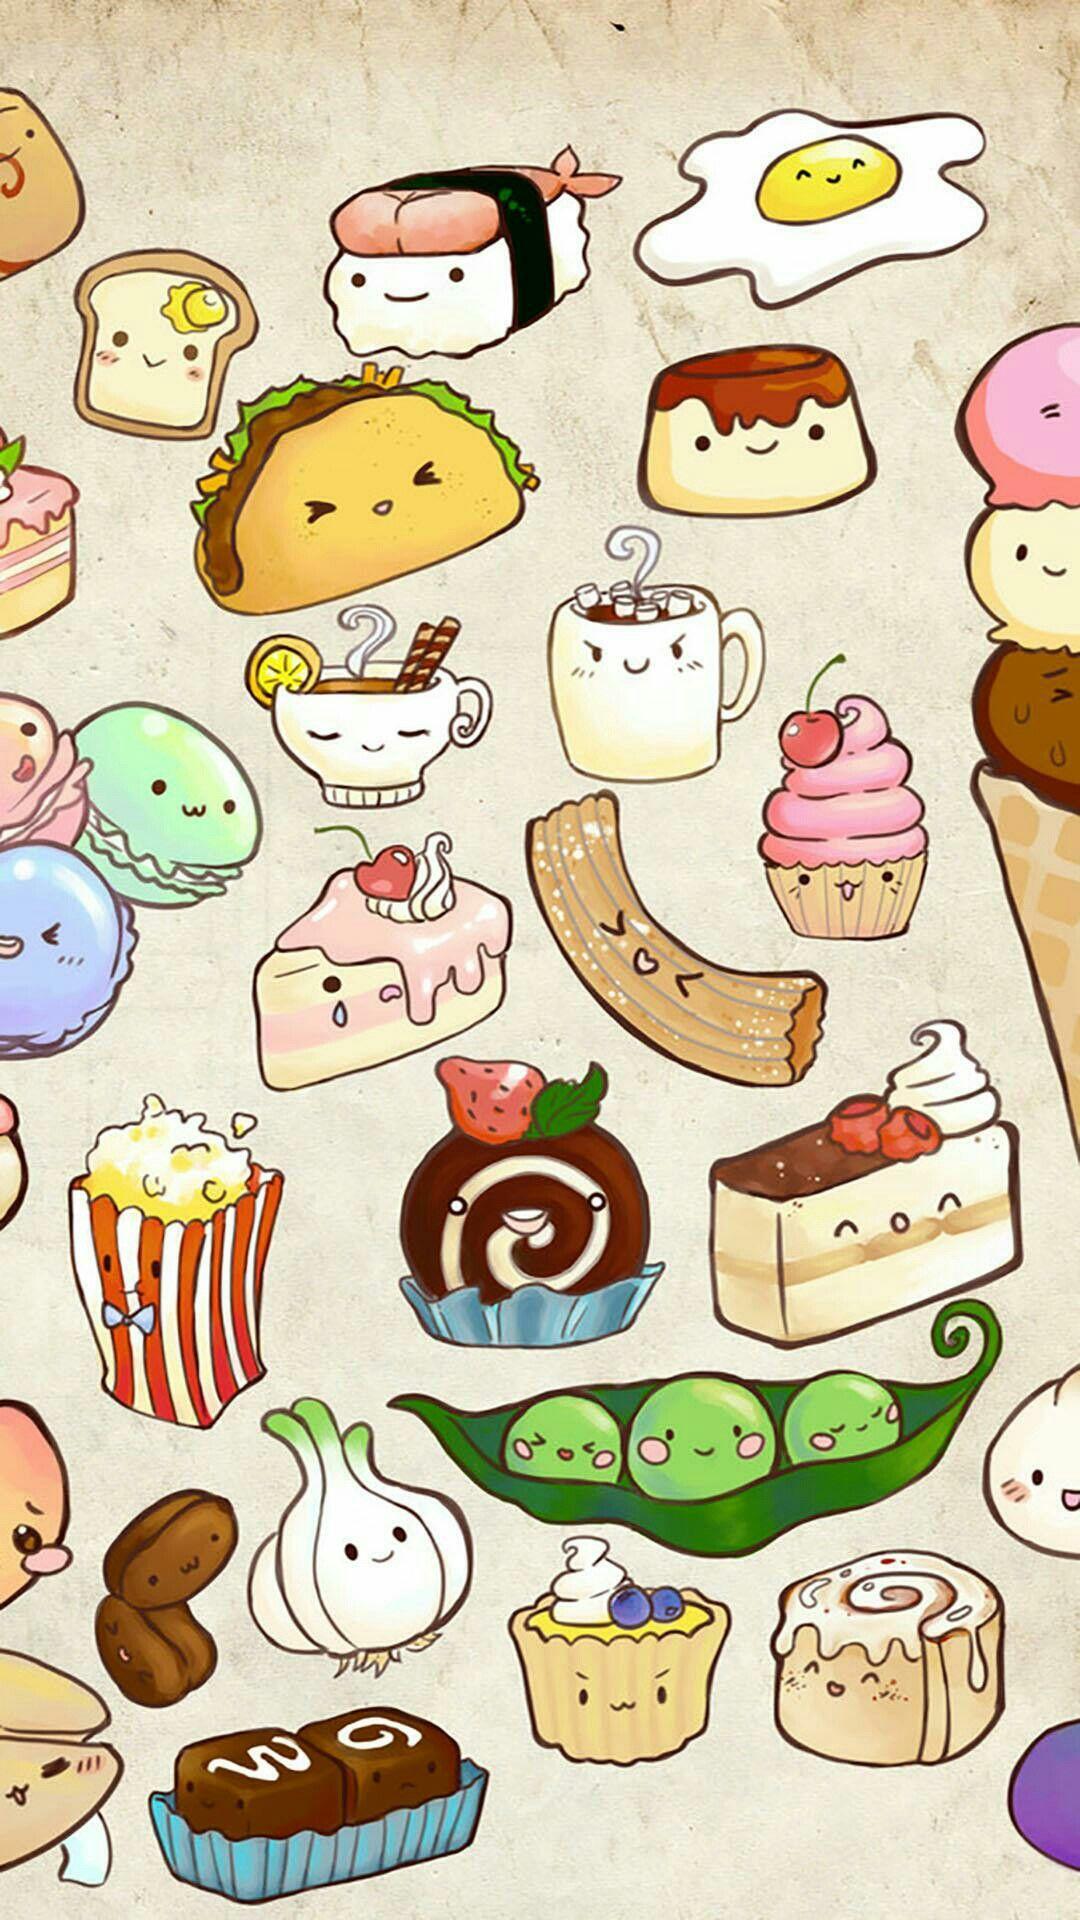 Cute Adorable Fun Junk Food Wallpaper Krjjejue Cute food 1080x1920